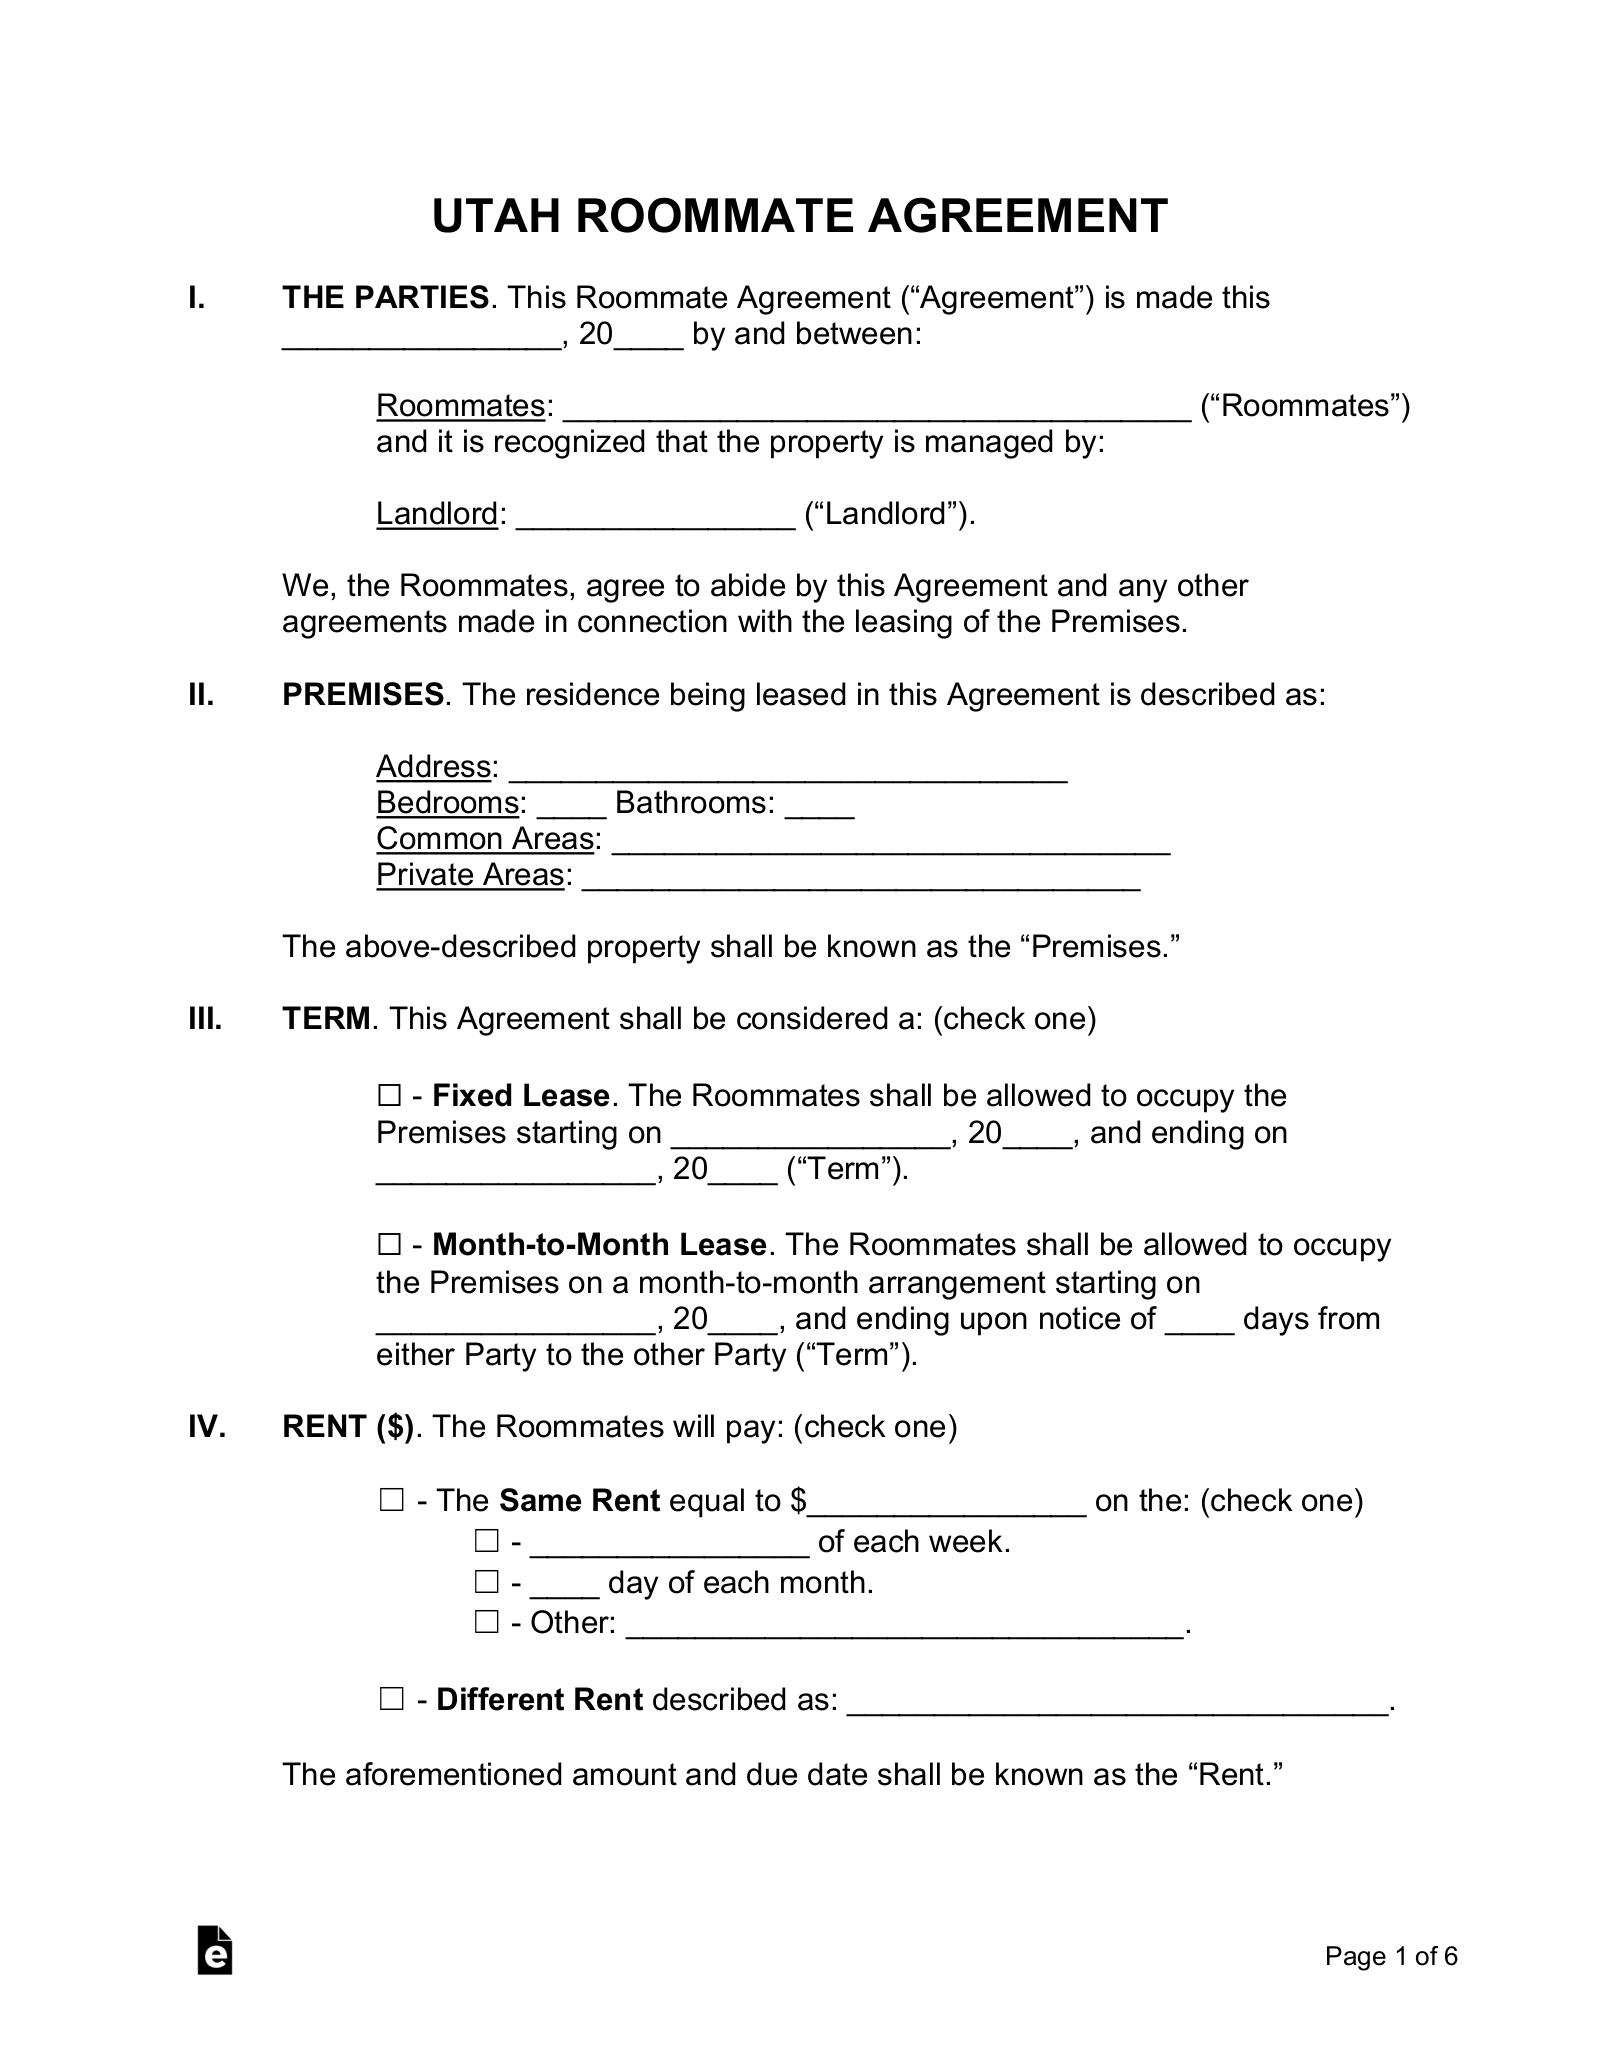 Free Utah Roommate Agreement Form Pdf Word Eforms